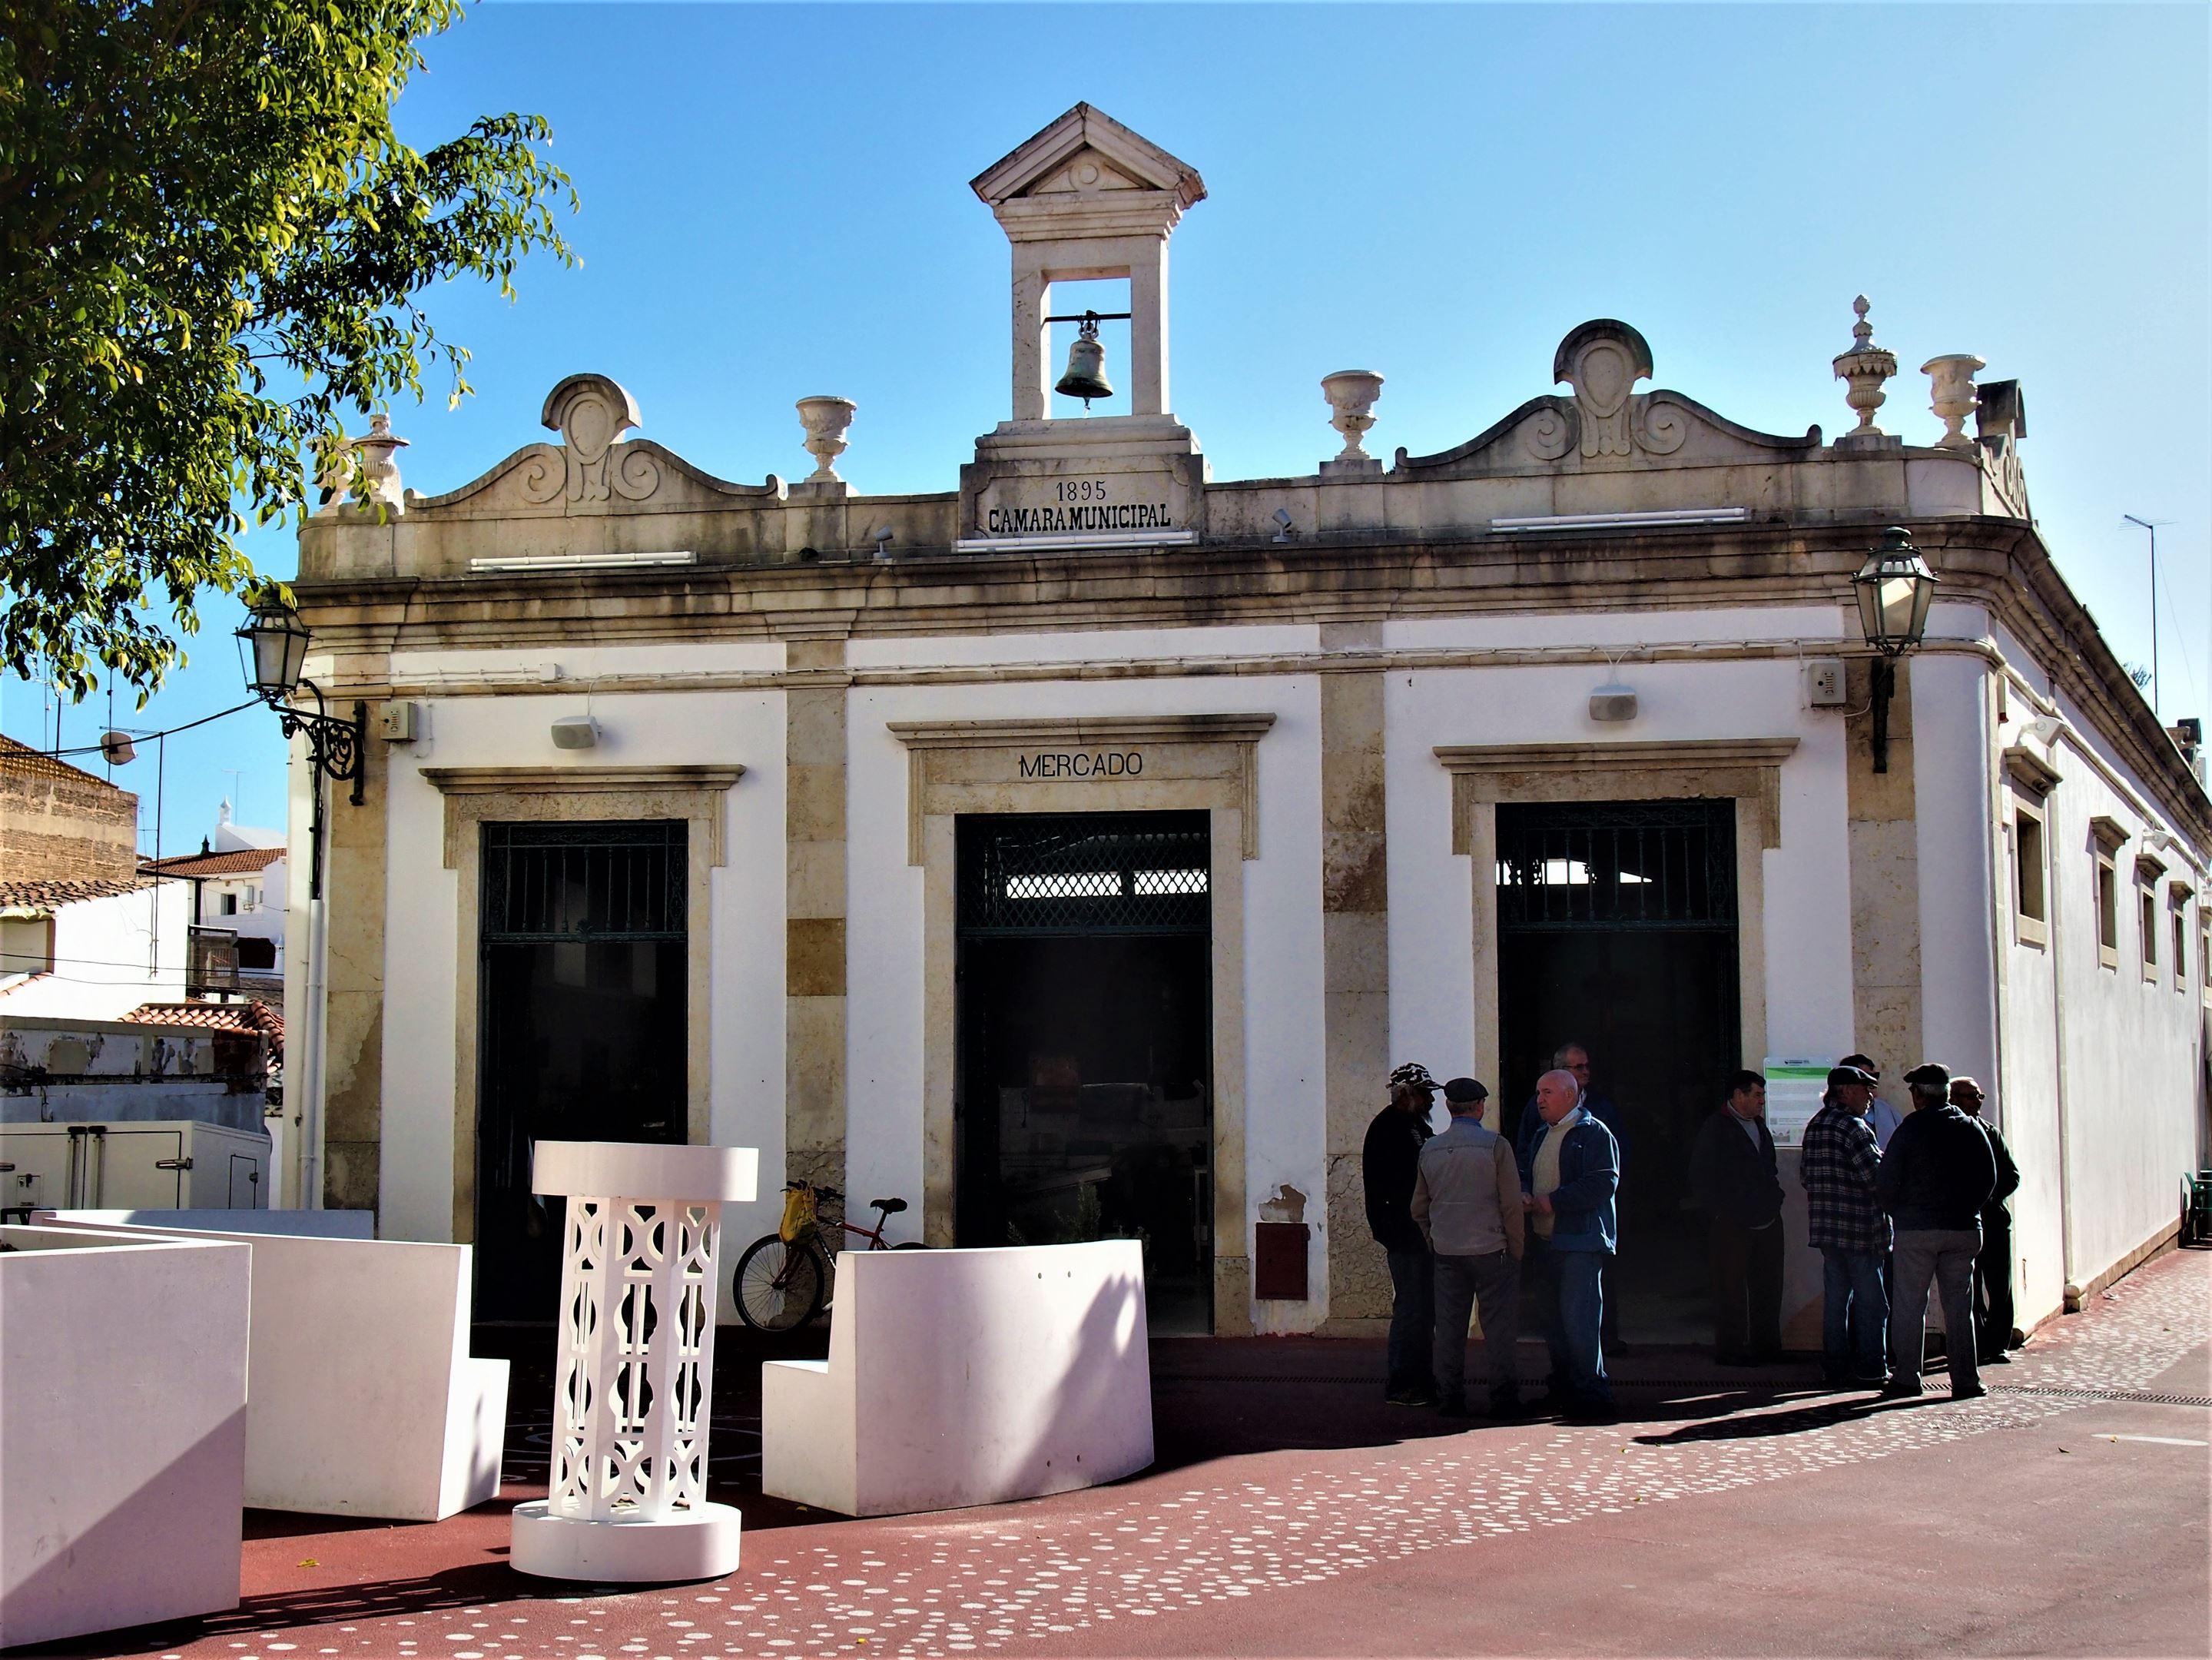 The Mercado Municipal (or Municipal Market) at Lagoa, Algarve